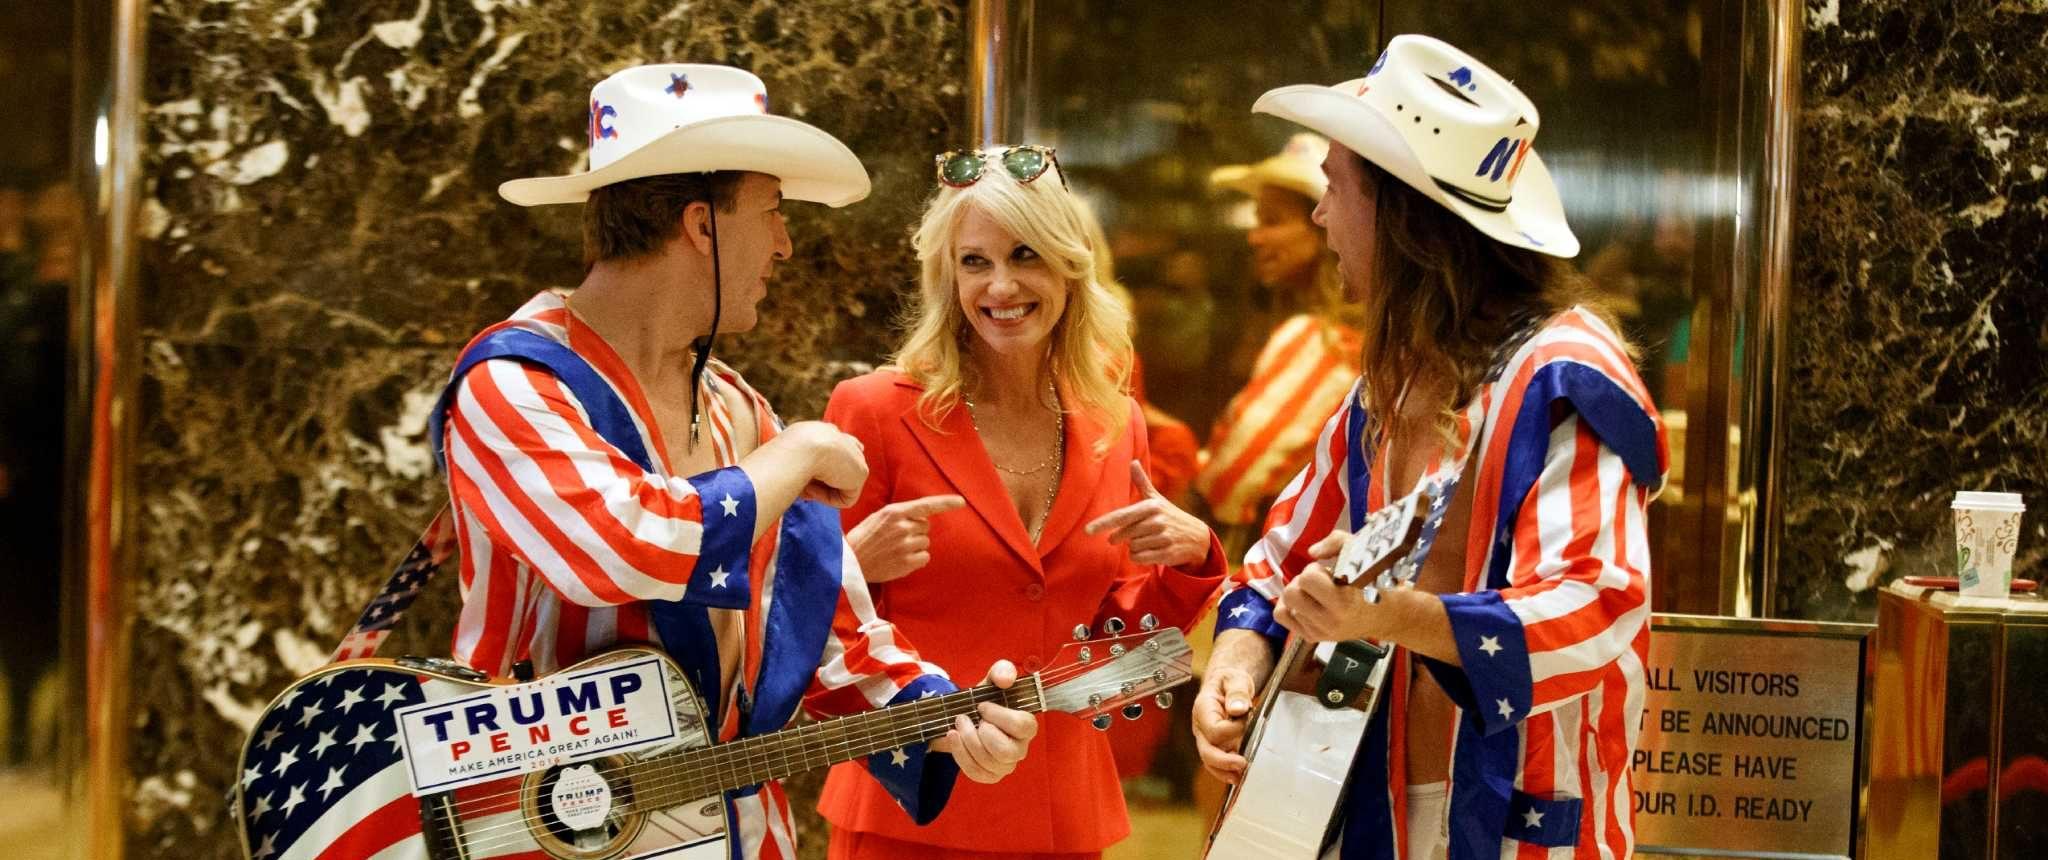 Kellyanne-Conway-Trump-11.28-e1480437020692.jpg